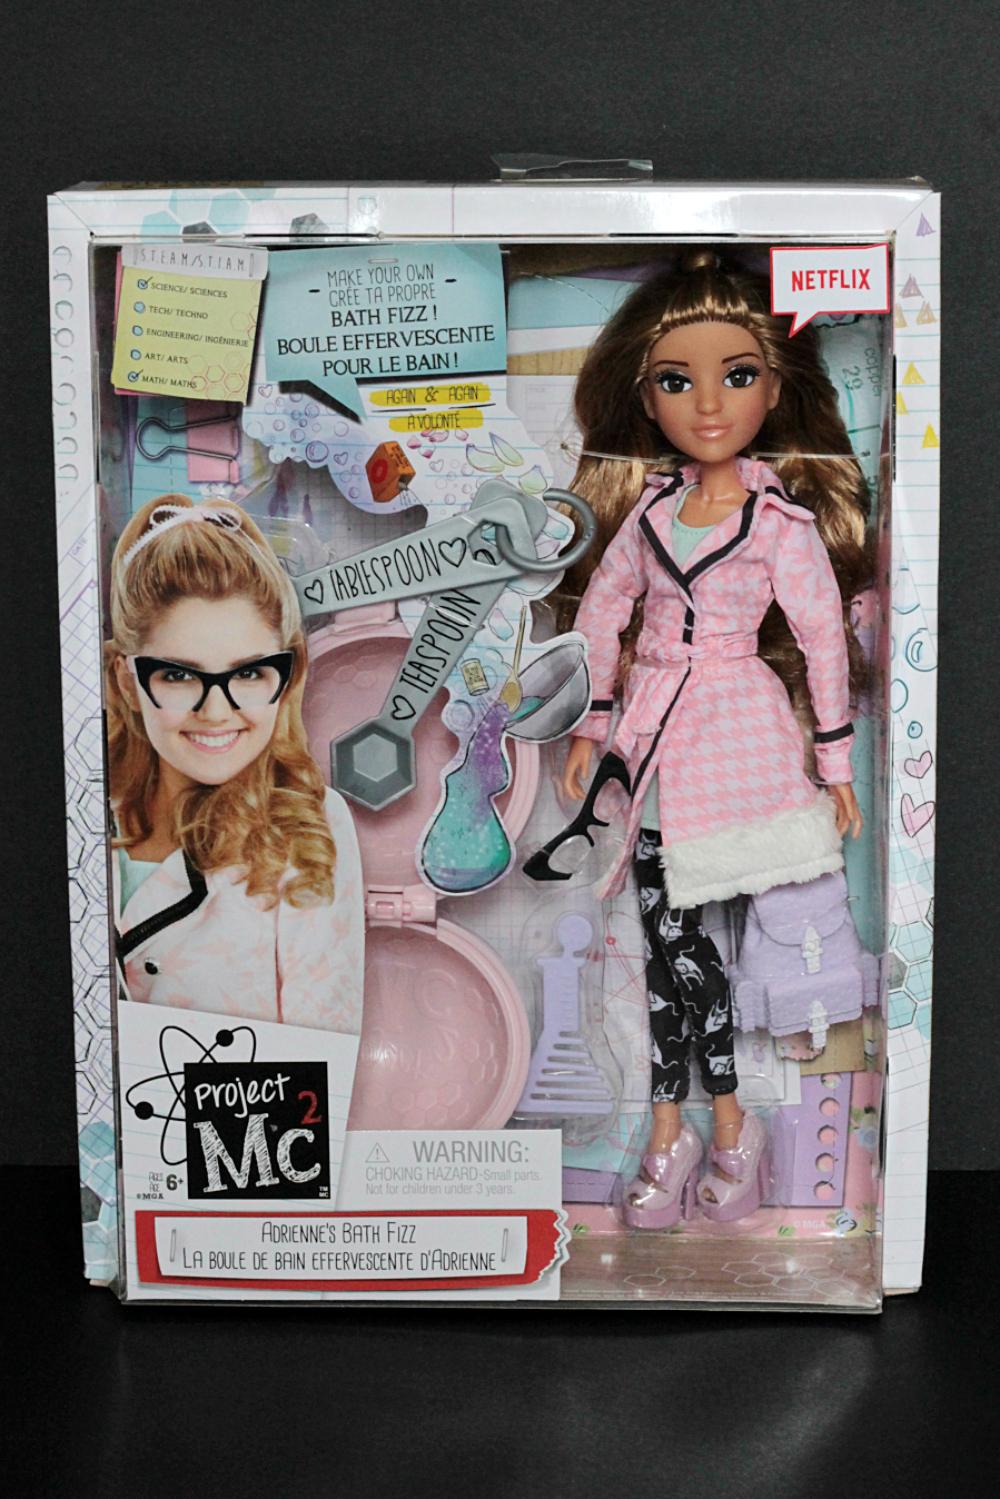 Project Mc² - Smart Is The New Cool! Adriennes Bath Fizz